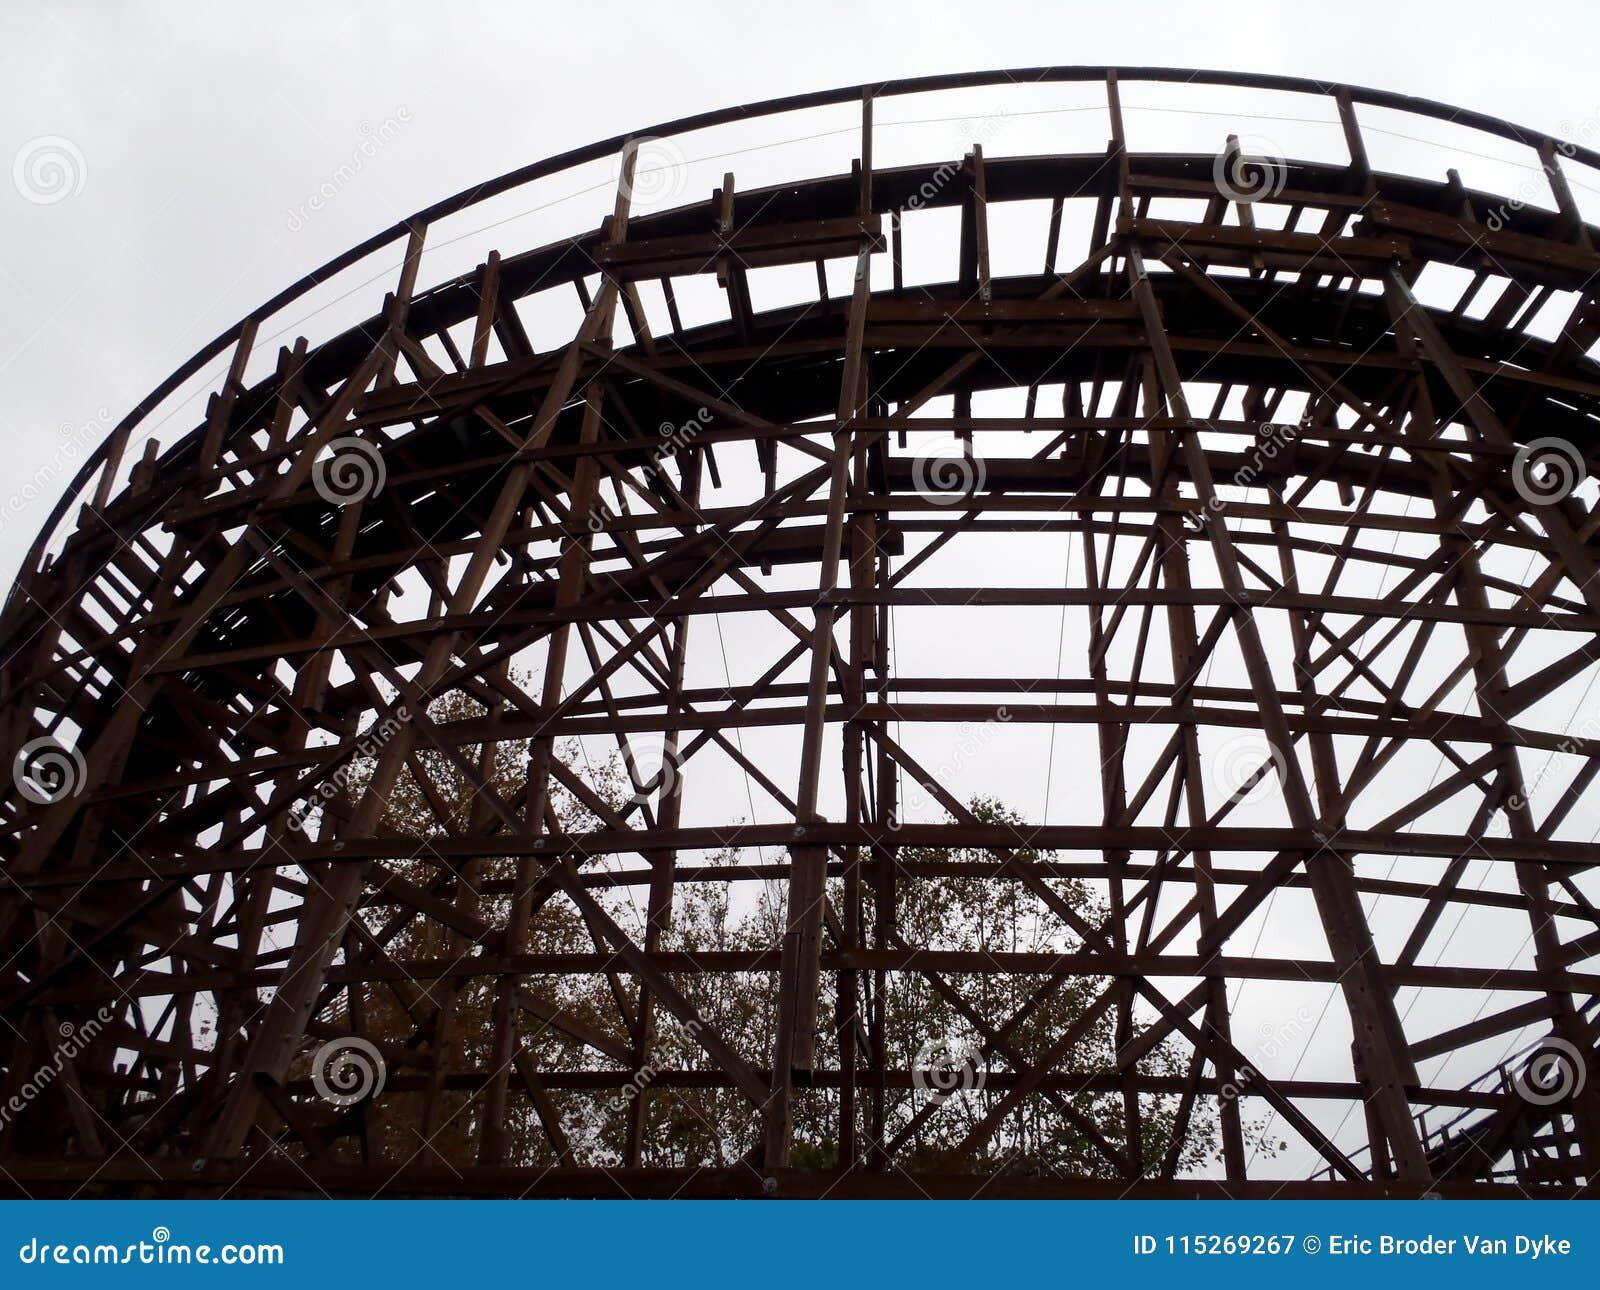 Looking upward at Wooden Rollercoaster